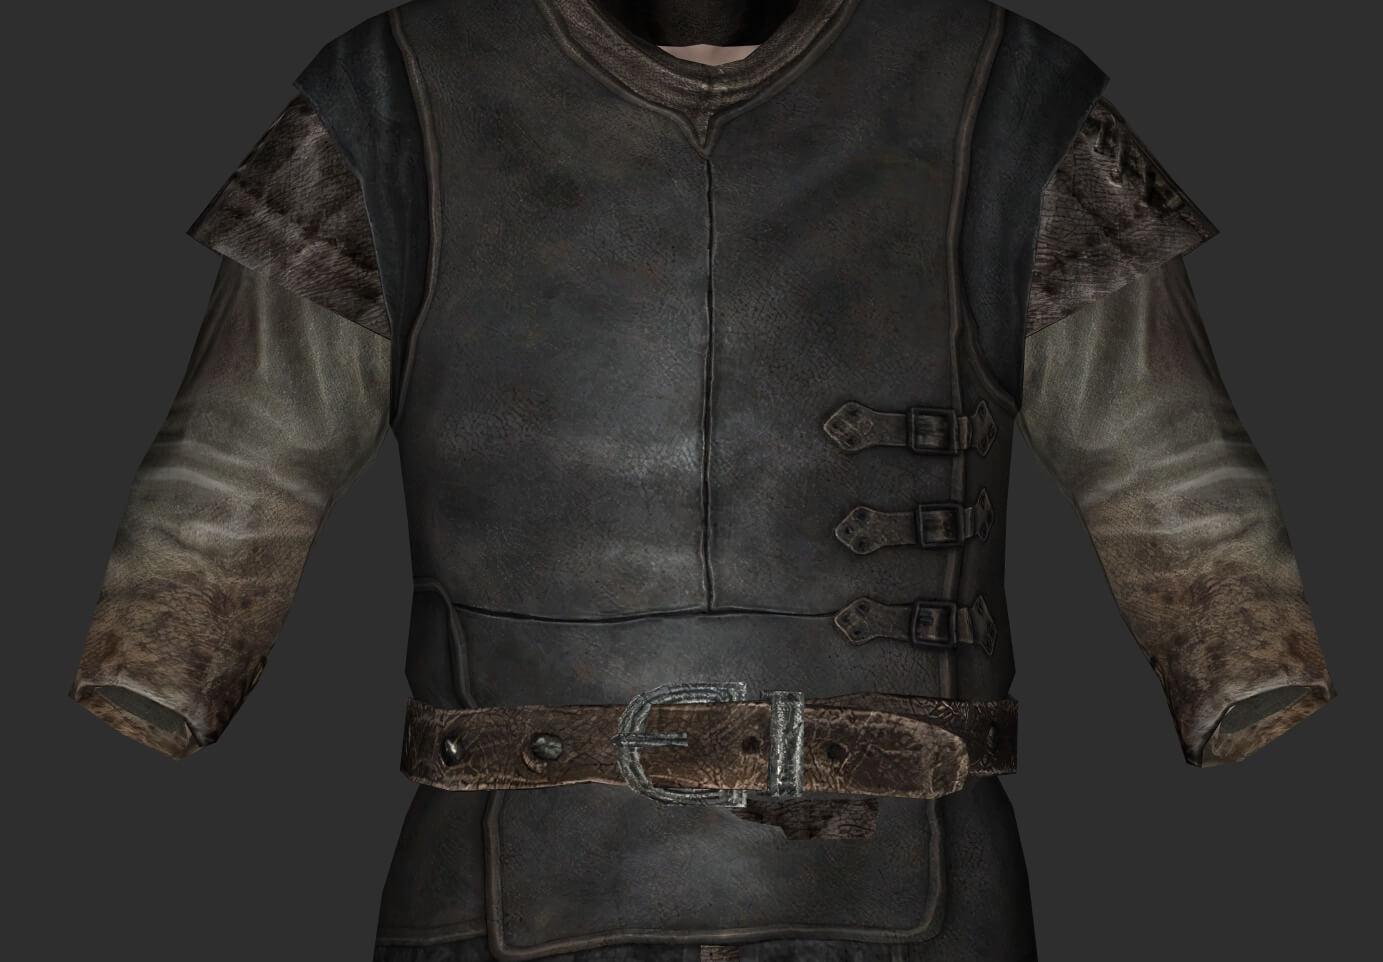 AI增强材质包让《上古卷轴5》普通衣物焕然一新